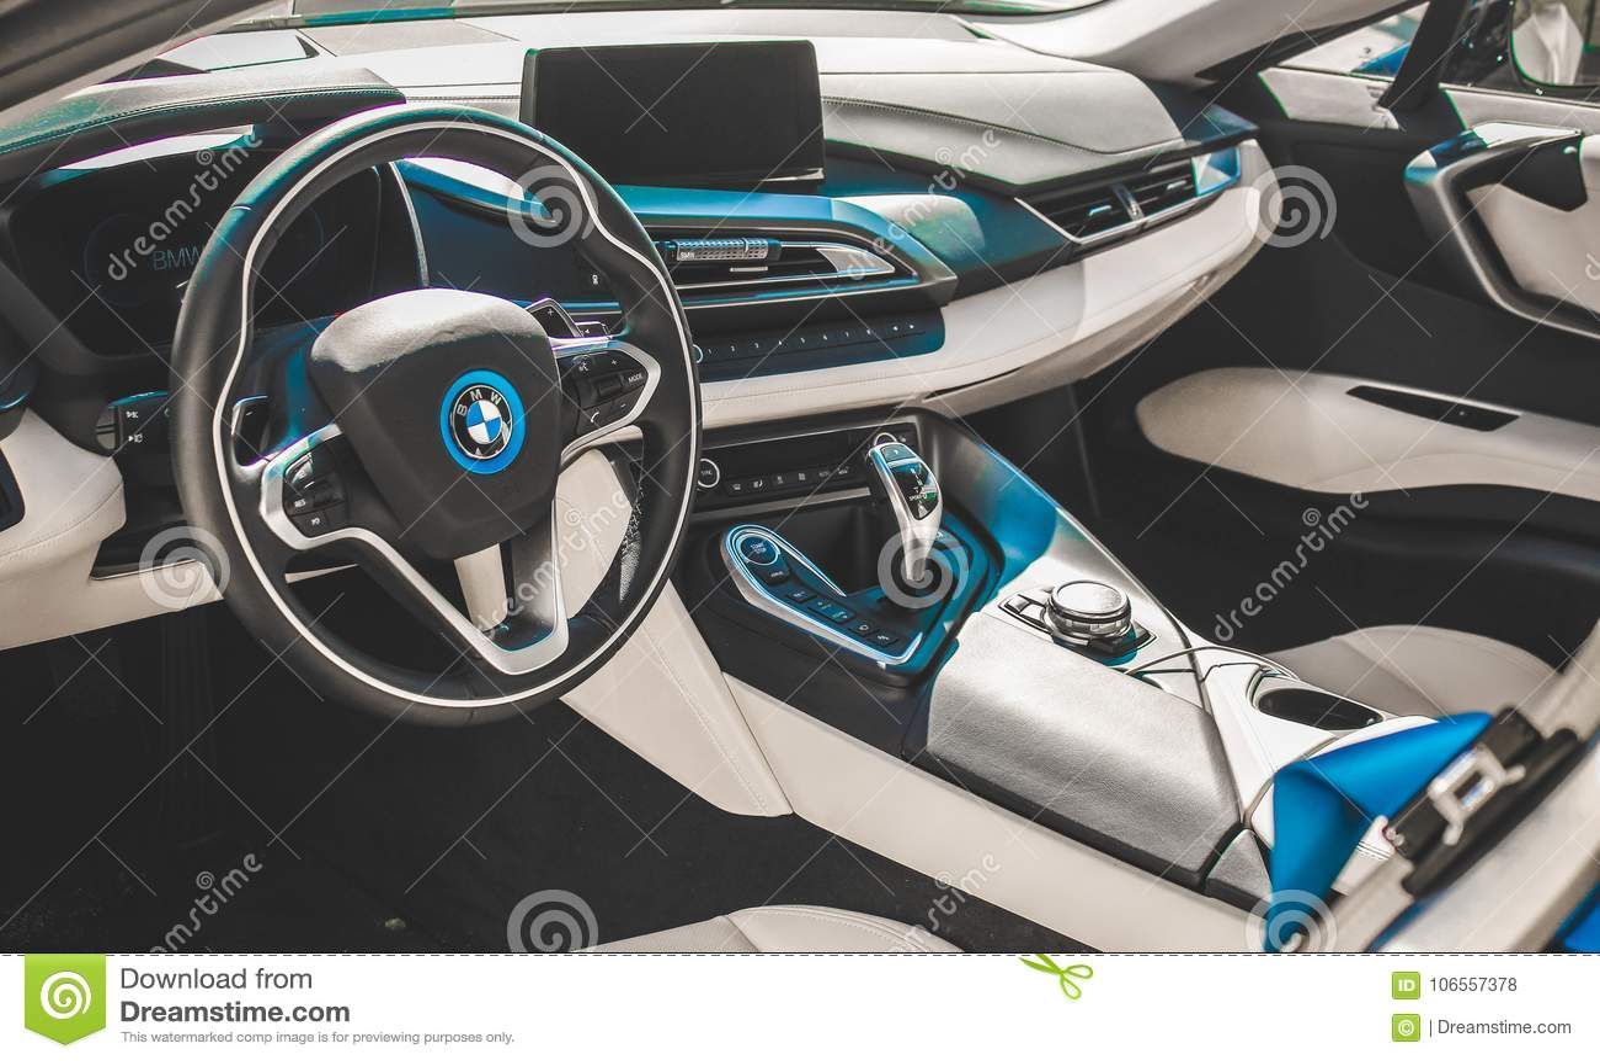 Bmw I8 Sport Car Interior Look Photo Taken At A Car Expo Editorial